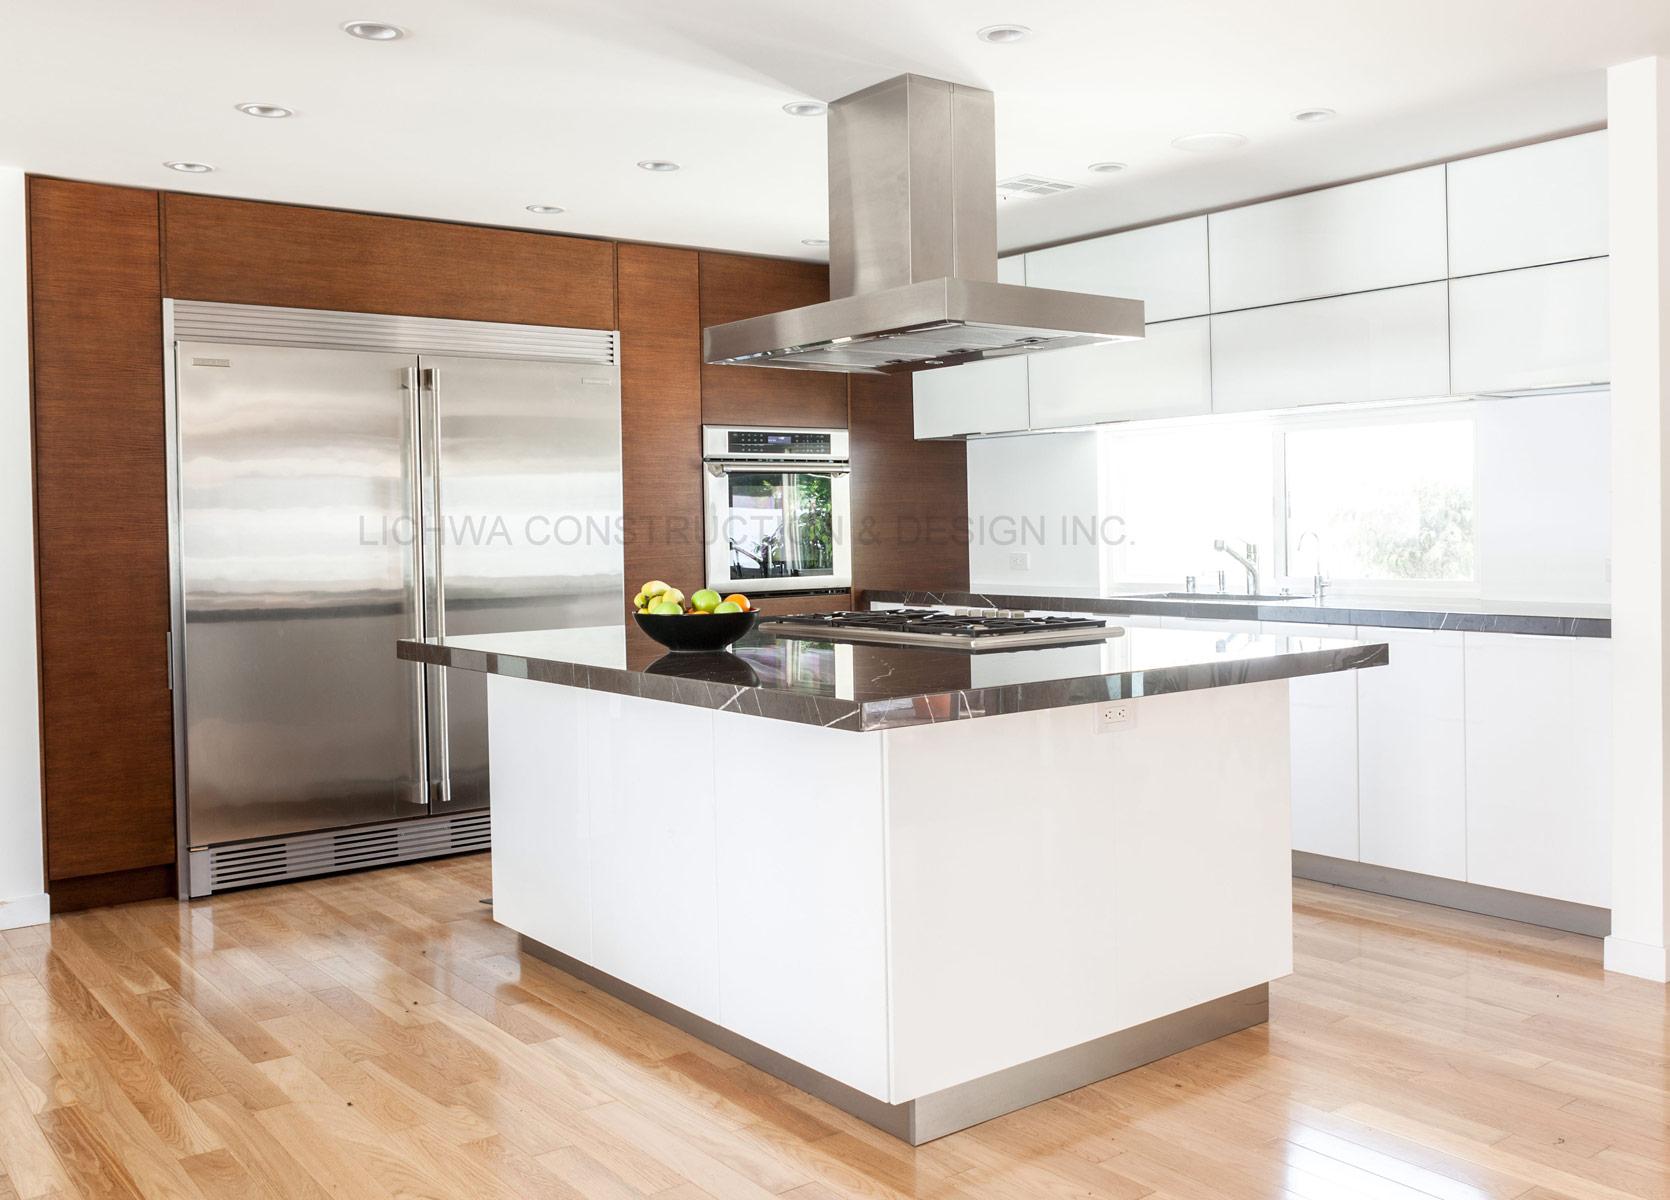 hollywood kitchen kitchen remodel las vegas Hollywood Kitchen Remodel 01